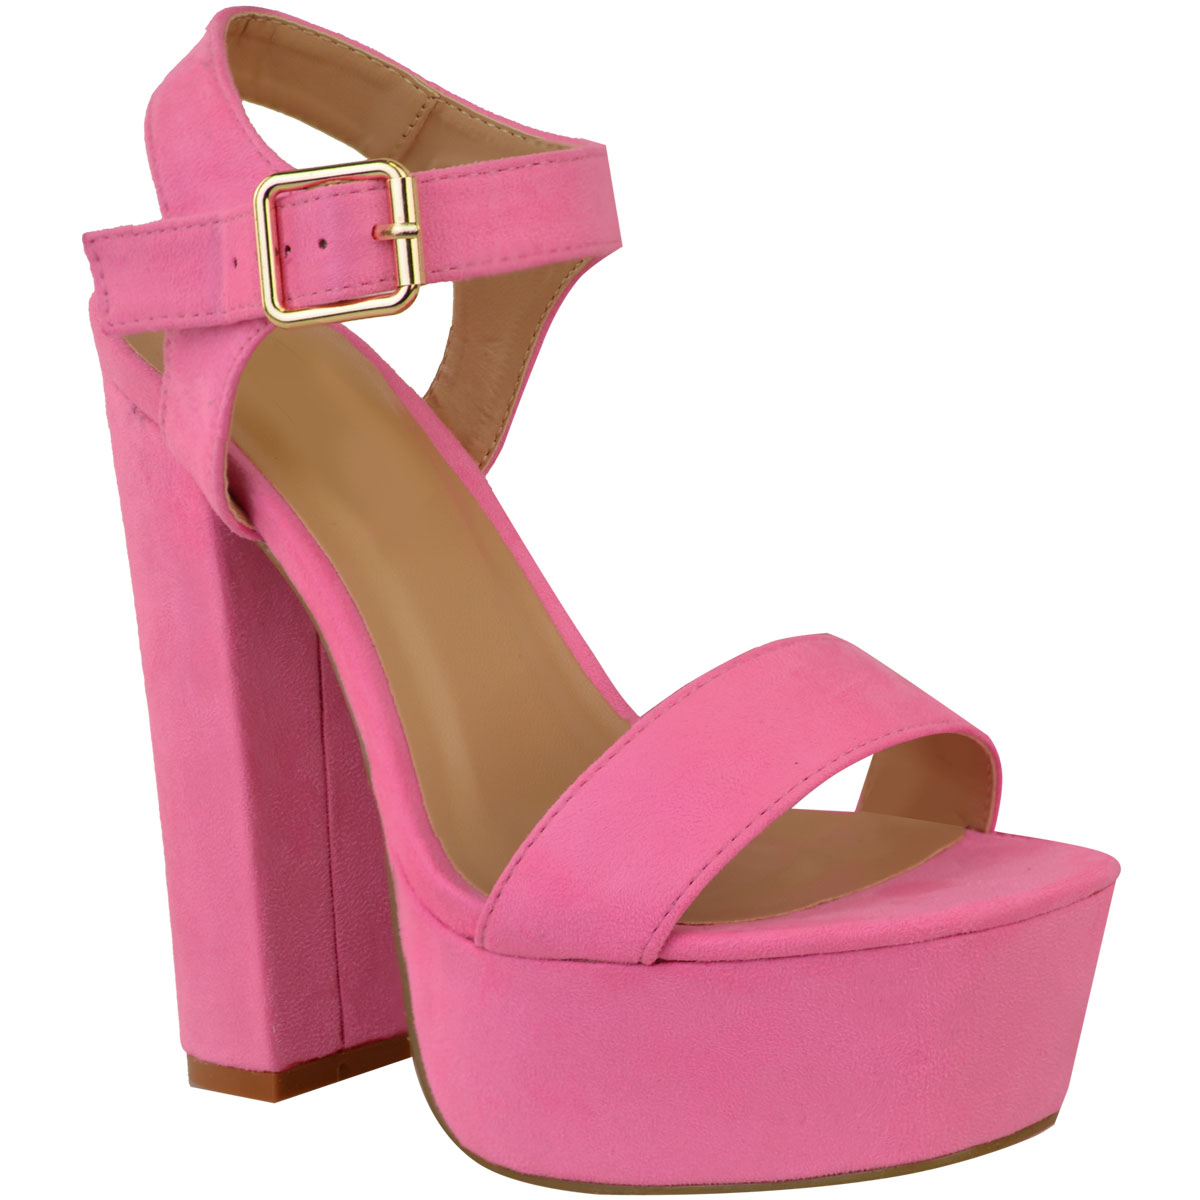 NUOVA linea donna estivi plateau tacco alto sandali DONNA LIBERA PUNTA Con Cinturini Scarpe Da Sera